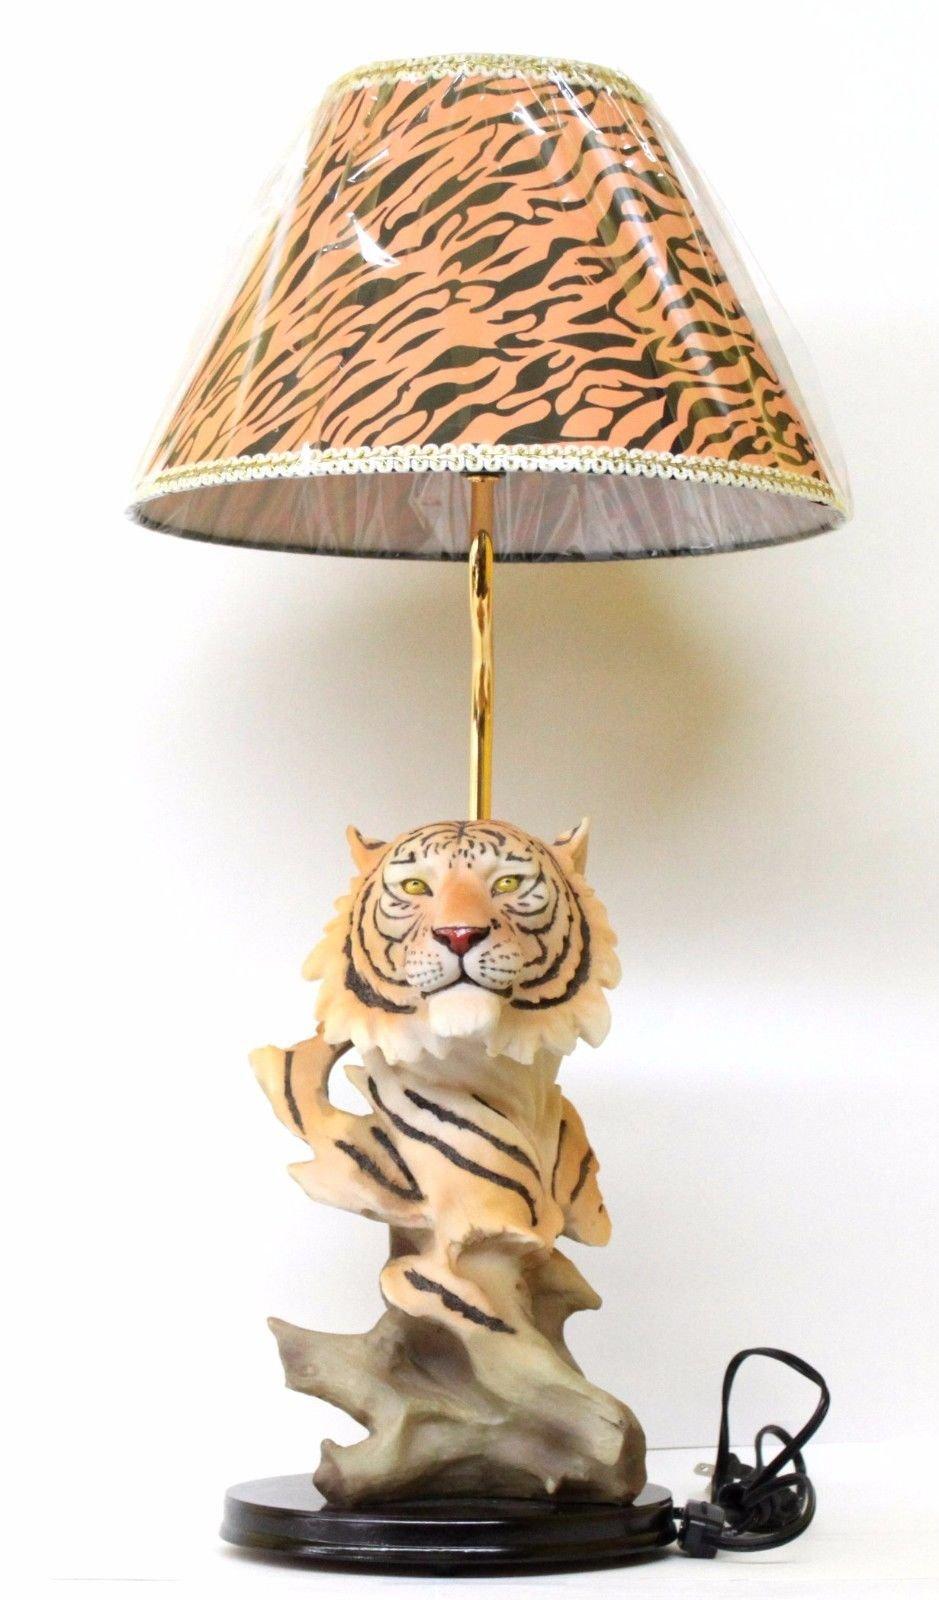 Tiger Statue Lamp with Tiger Striped Print Lamp Shade - Safari Animal Home Decor by Googol